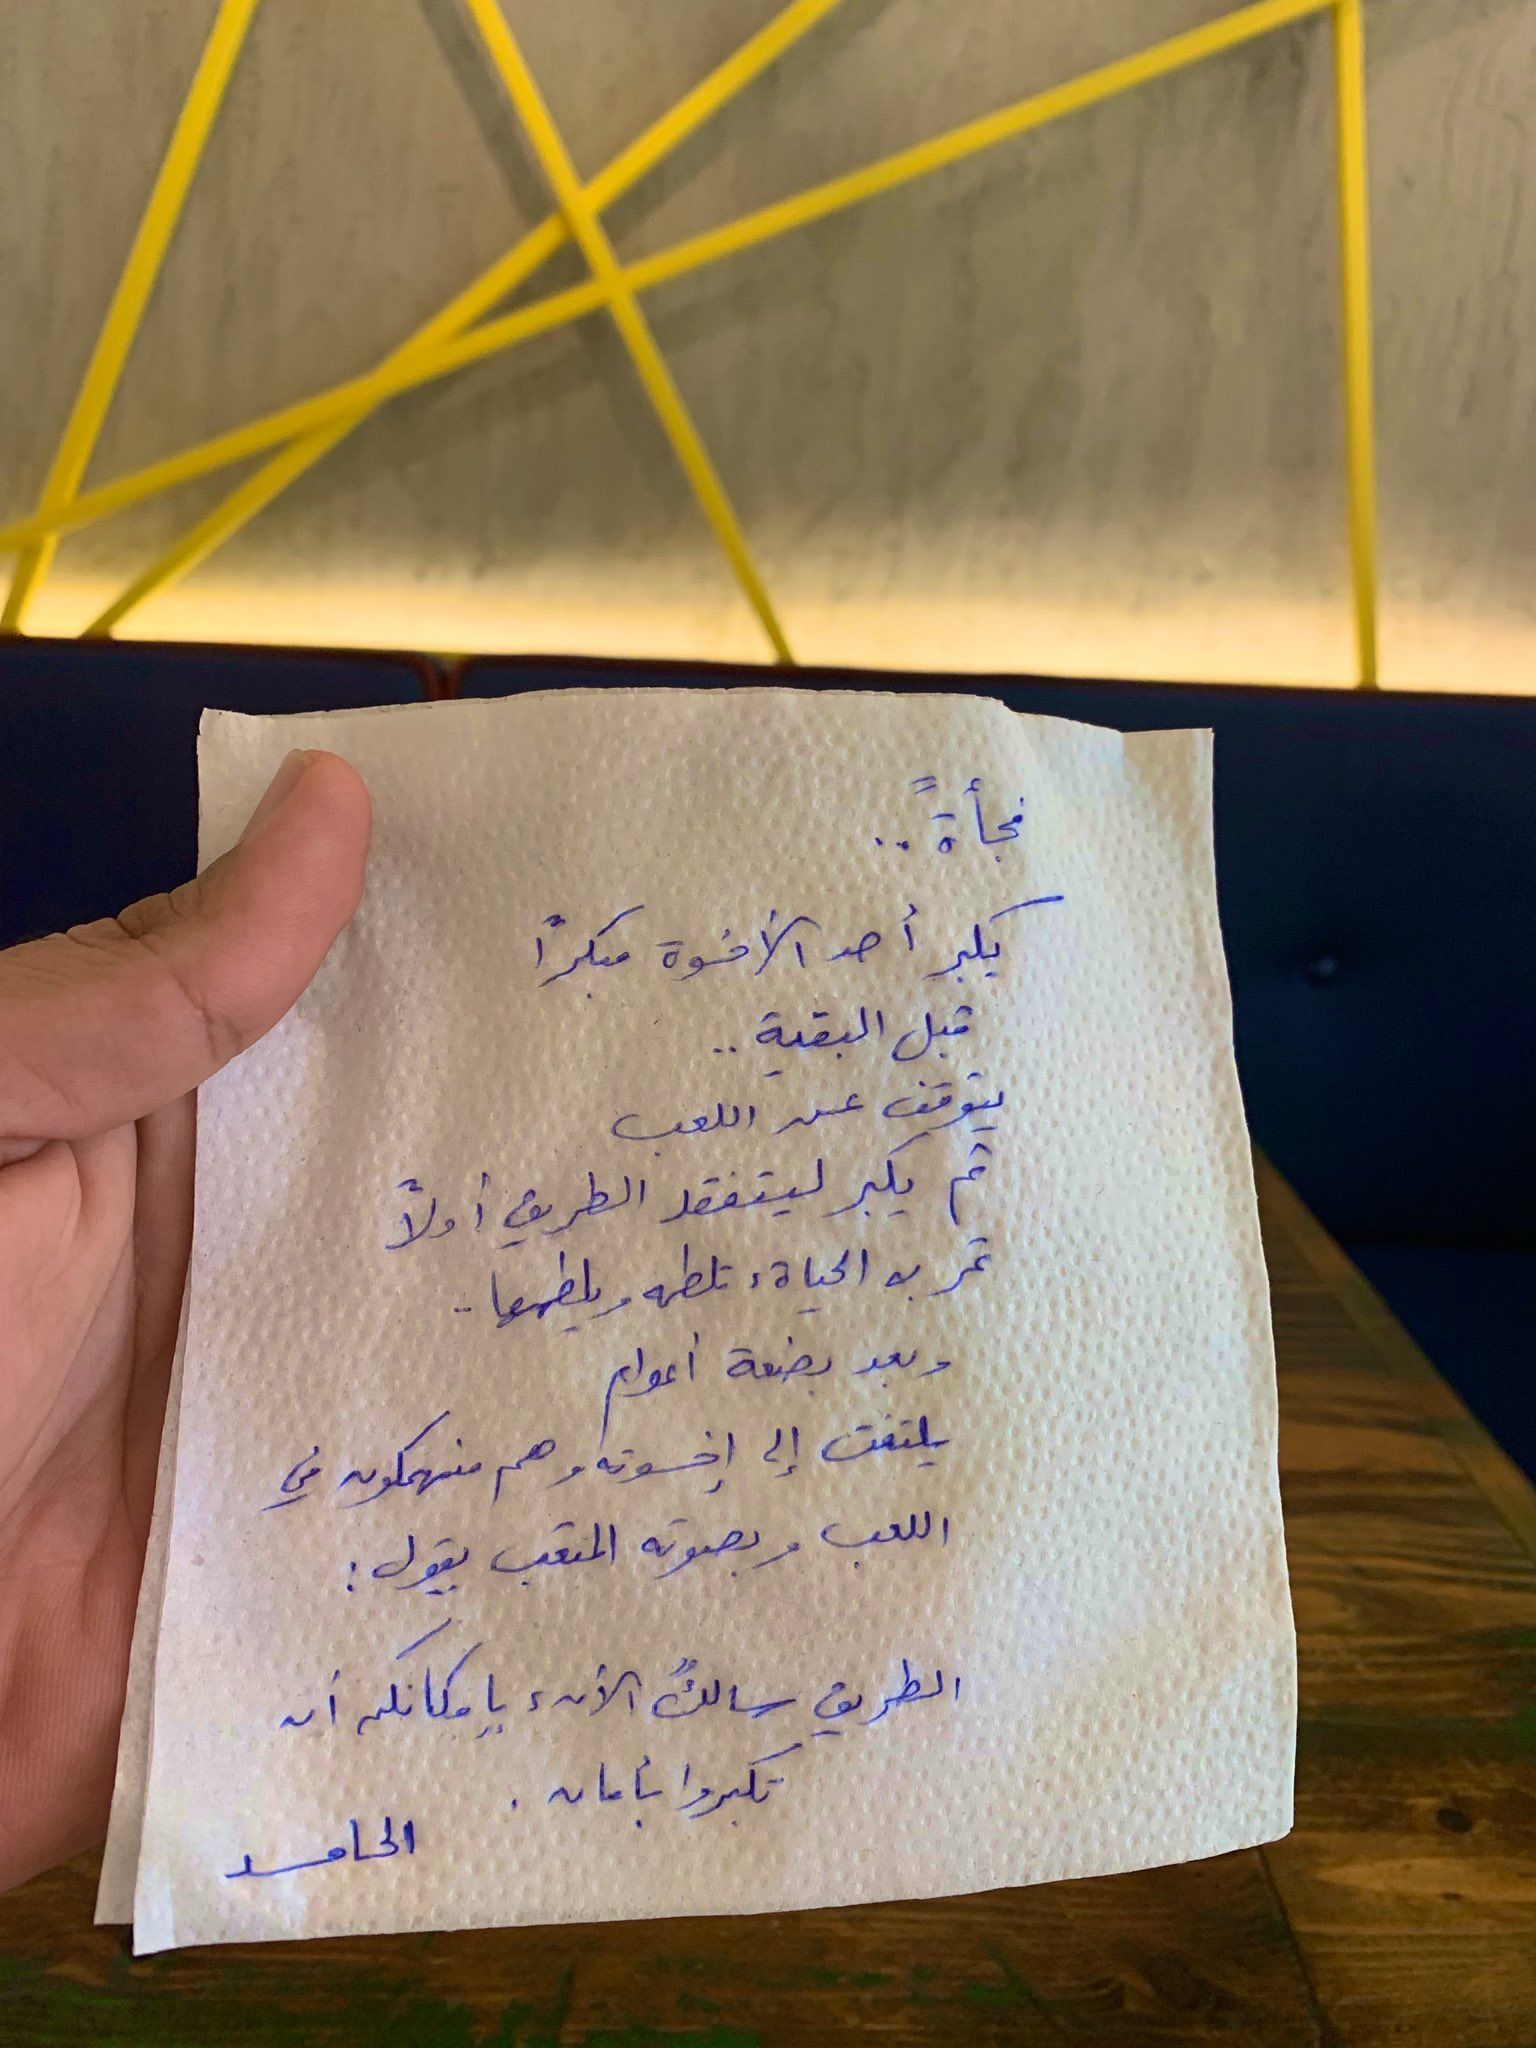 الأخ الأكبر الحامد Mixed Feelings Quotes Beautiful Arabic Words Funny Arabic Quotes